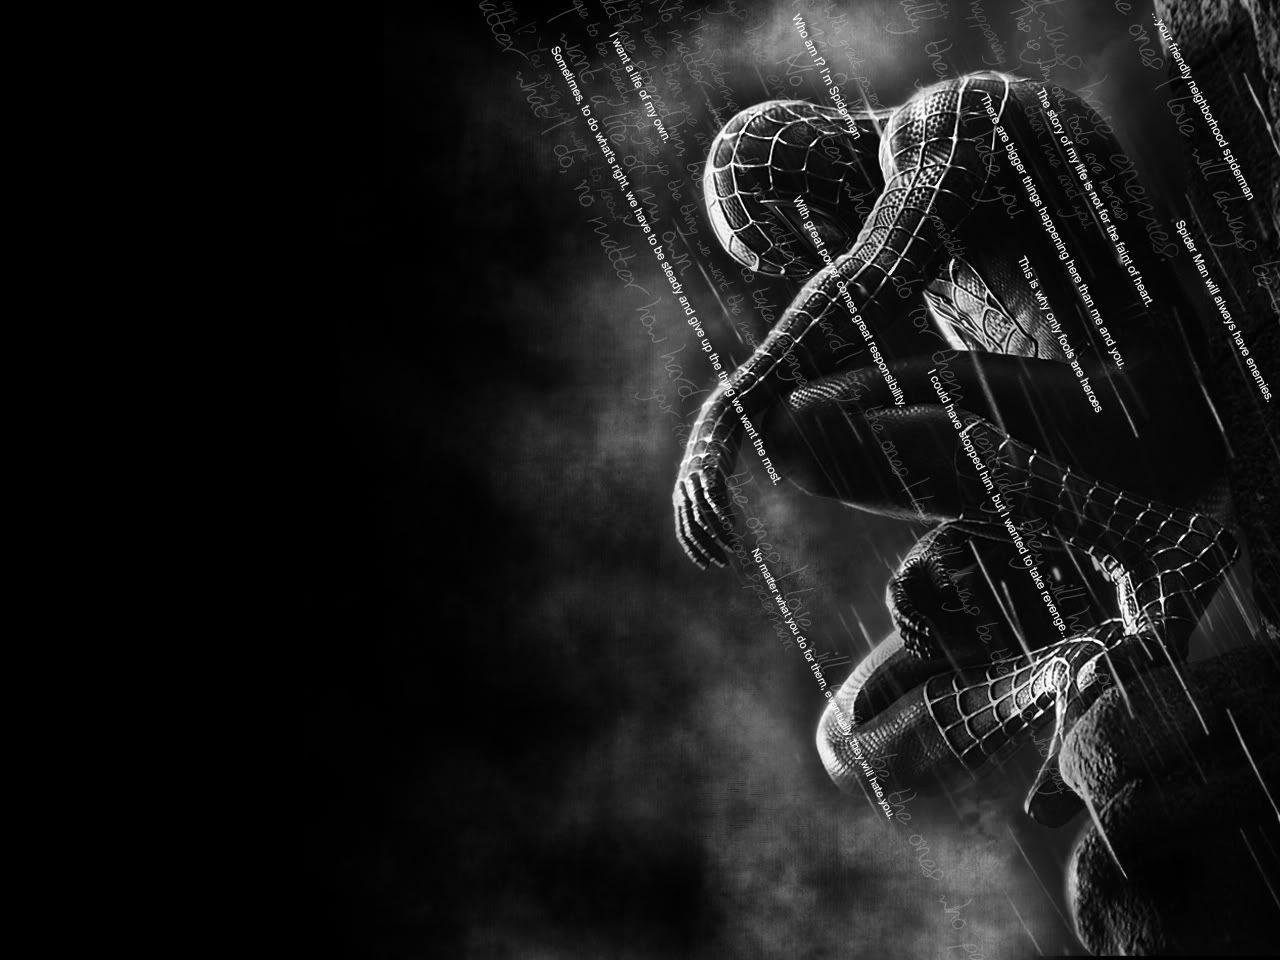 Hd wallpaper spiderman - Hd Spiderman Wallpapers Wallpaper